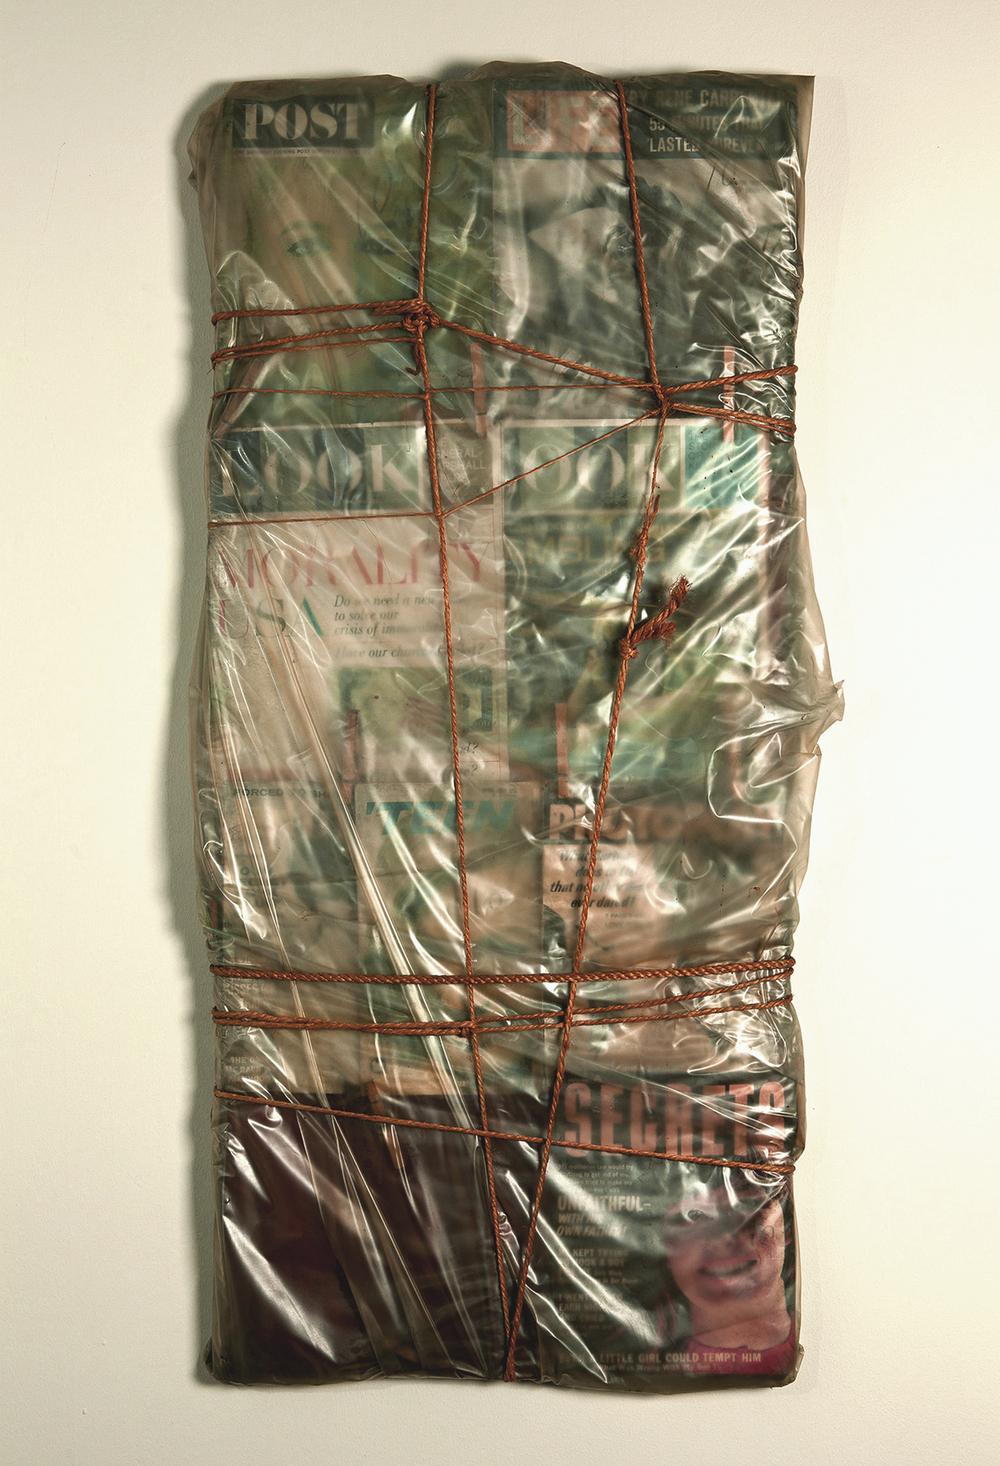 Christo 1964 Untitled (Post, Look) copy.jpg